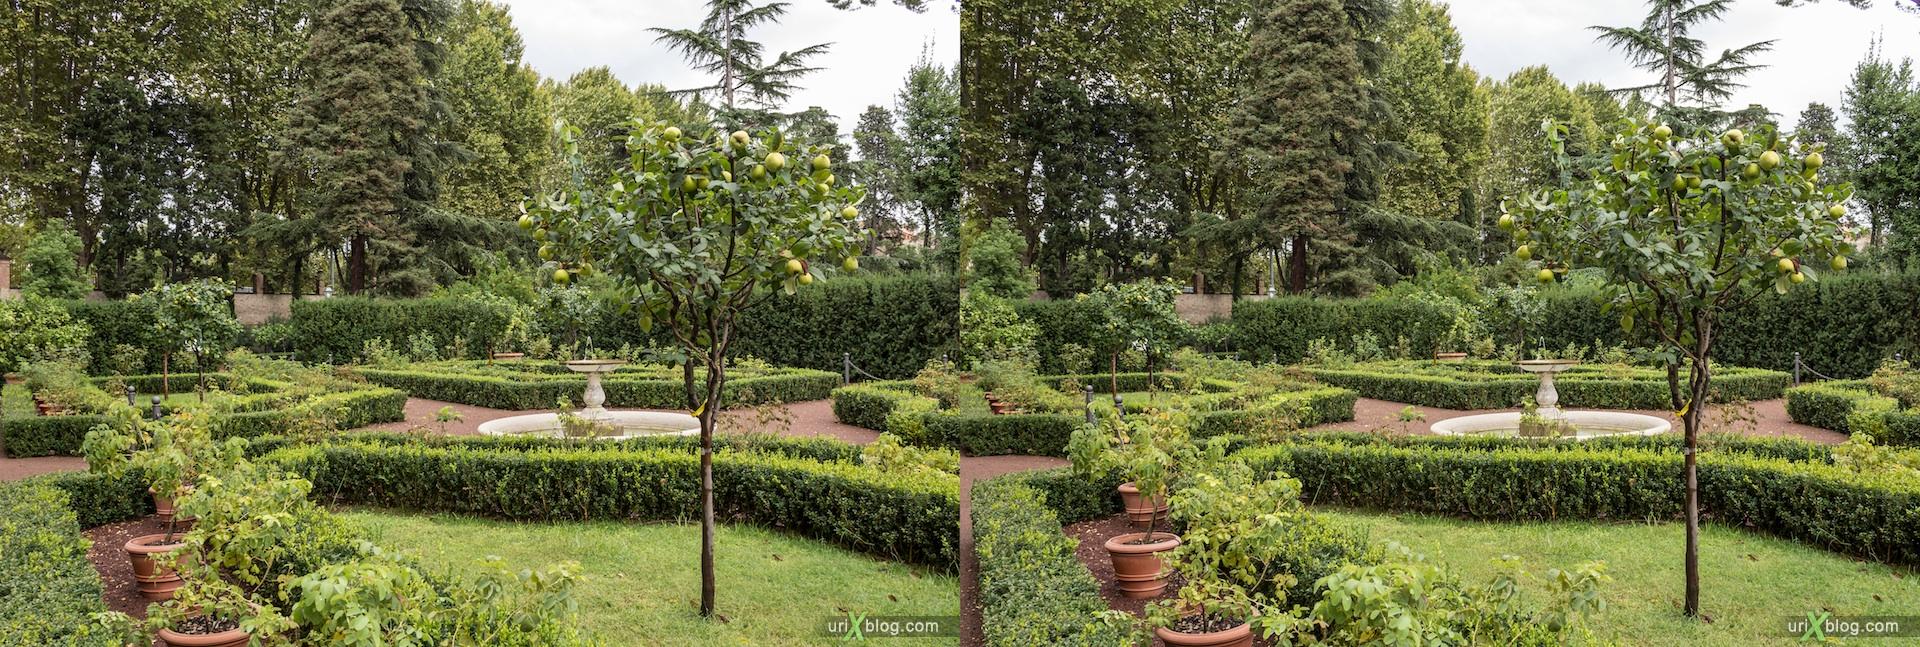 2012, Villa Farnesina, fountain, lemons, Rome, Italy, Europe, 3D, stereo pair, cross-eyed, crossview, cross view stereo pair